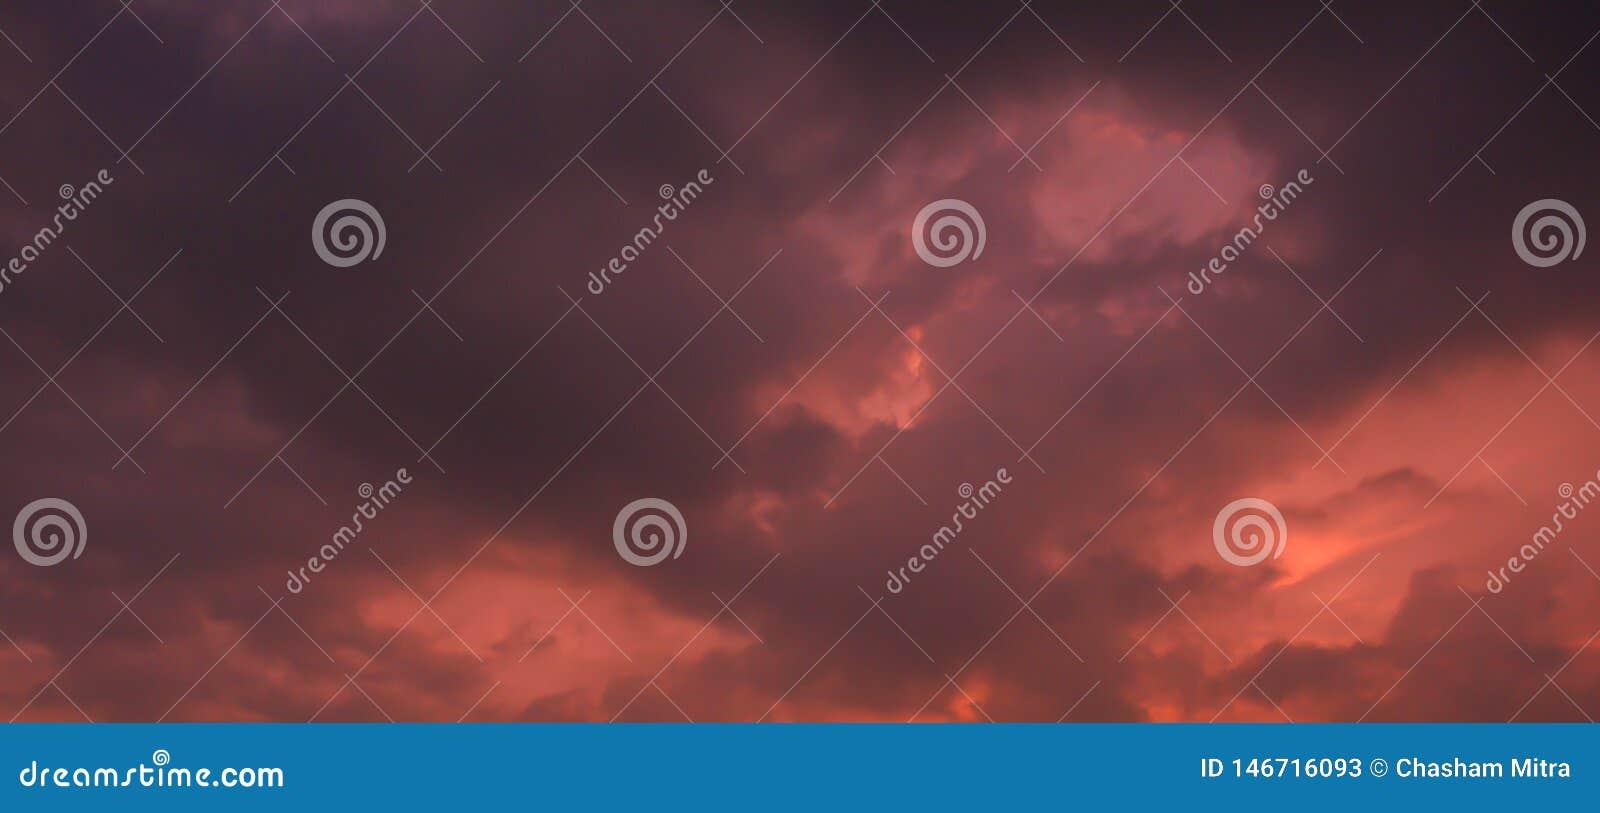 Nubes oscuras en un día con tempestad de truenos